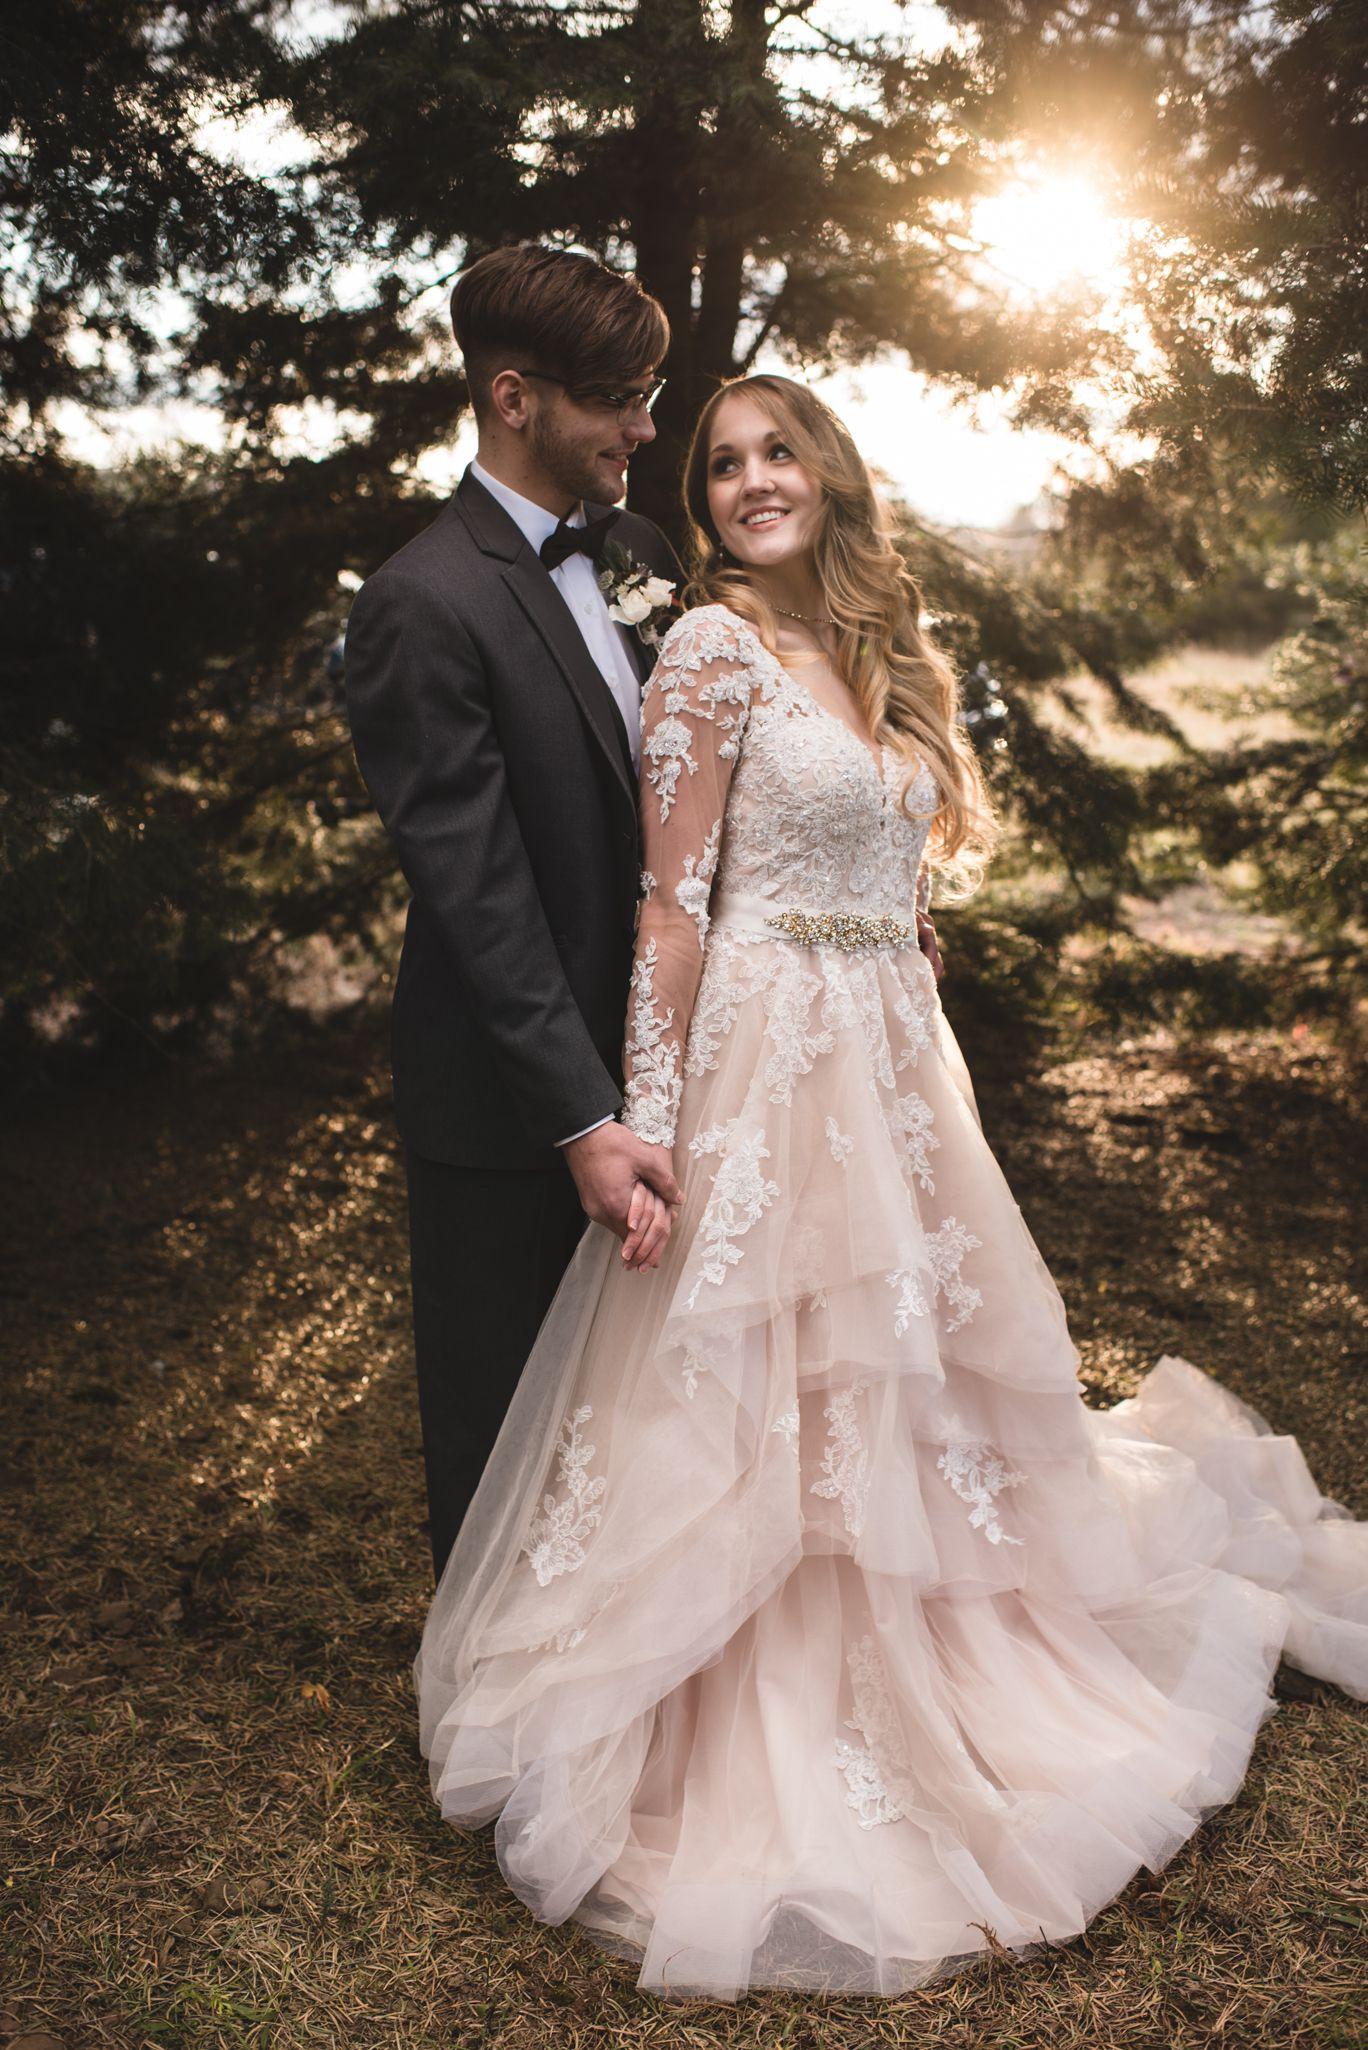 Styled Wedding Winterberry Tree Farm Long Sleeve Wedding Dress Lace Wedding Dress Champagne Wedding Dresses Lace [ 2050 x 1368 Pixel ]